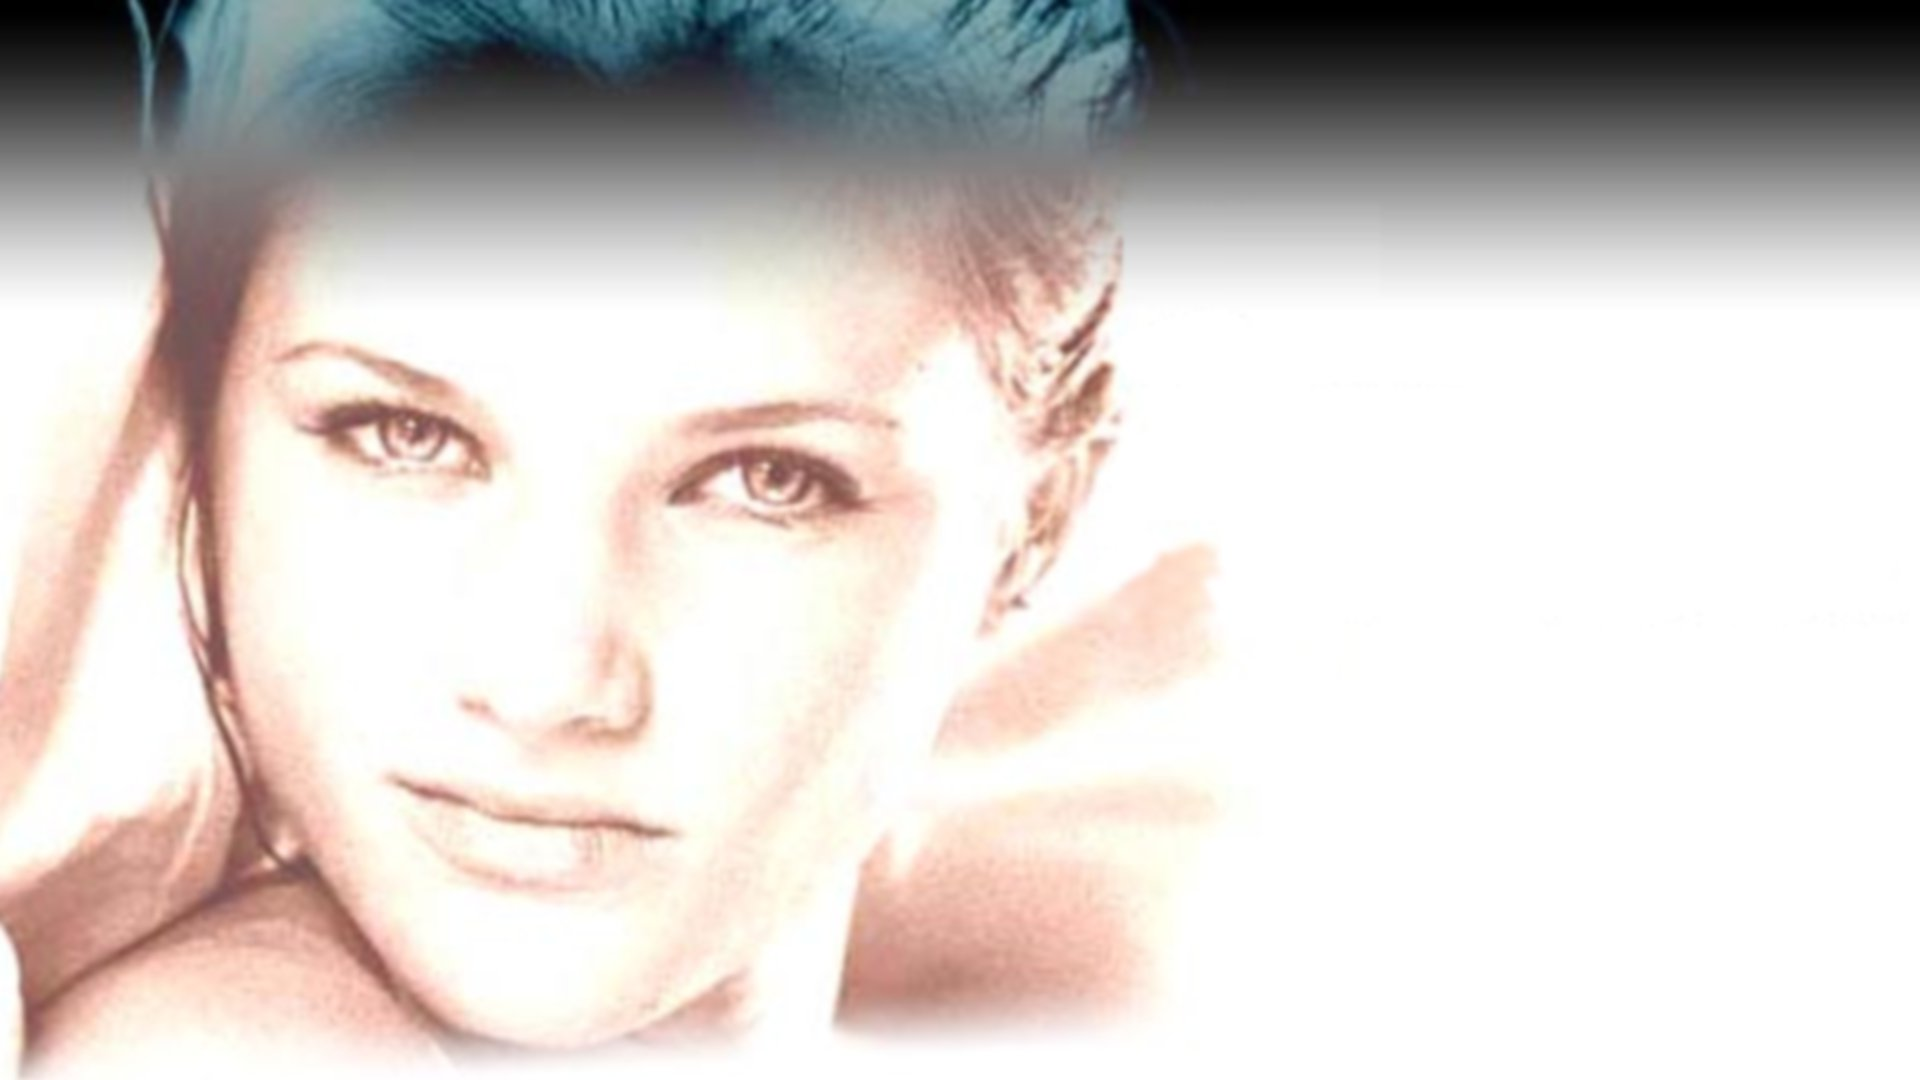 Portland Electrolysis & Skin Care   Permanent Hair Removal